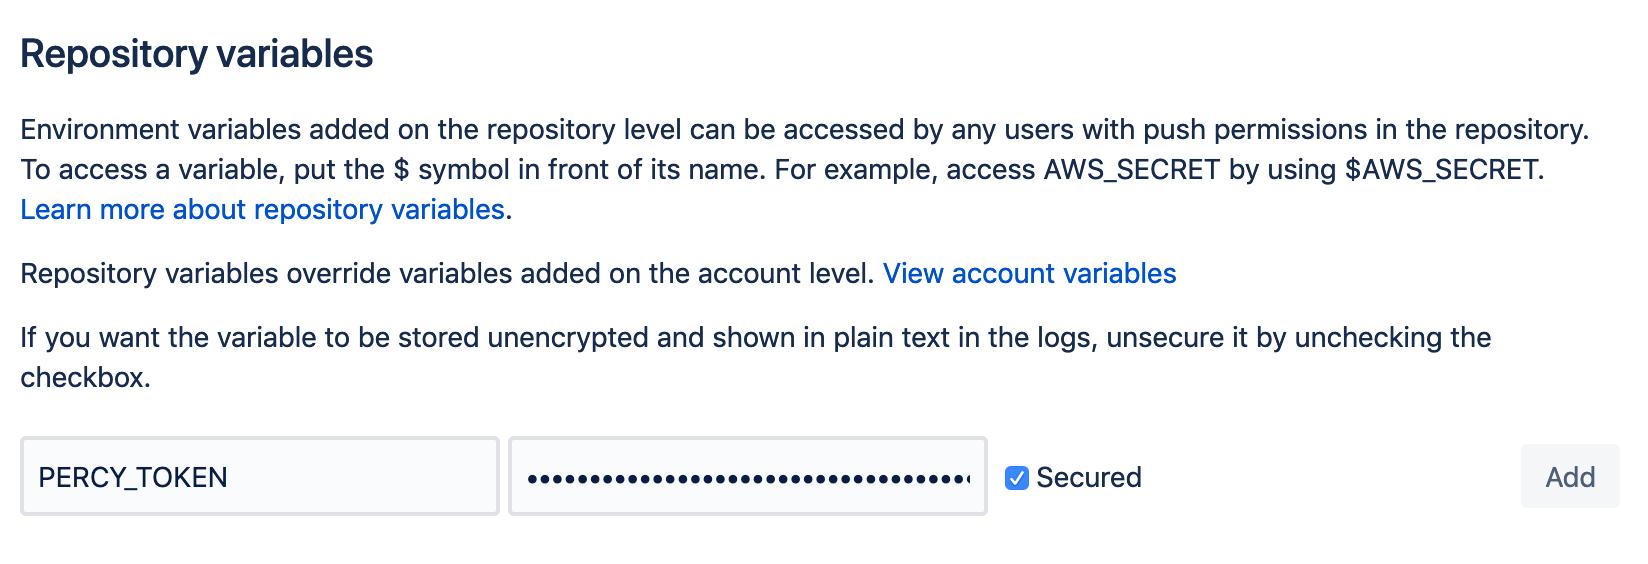 Bitbucket Pipelines' Repository variable settings